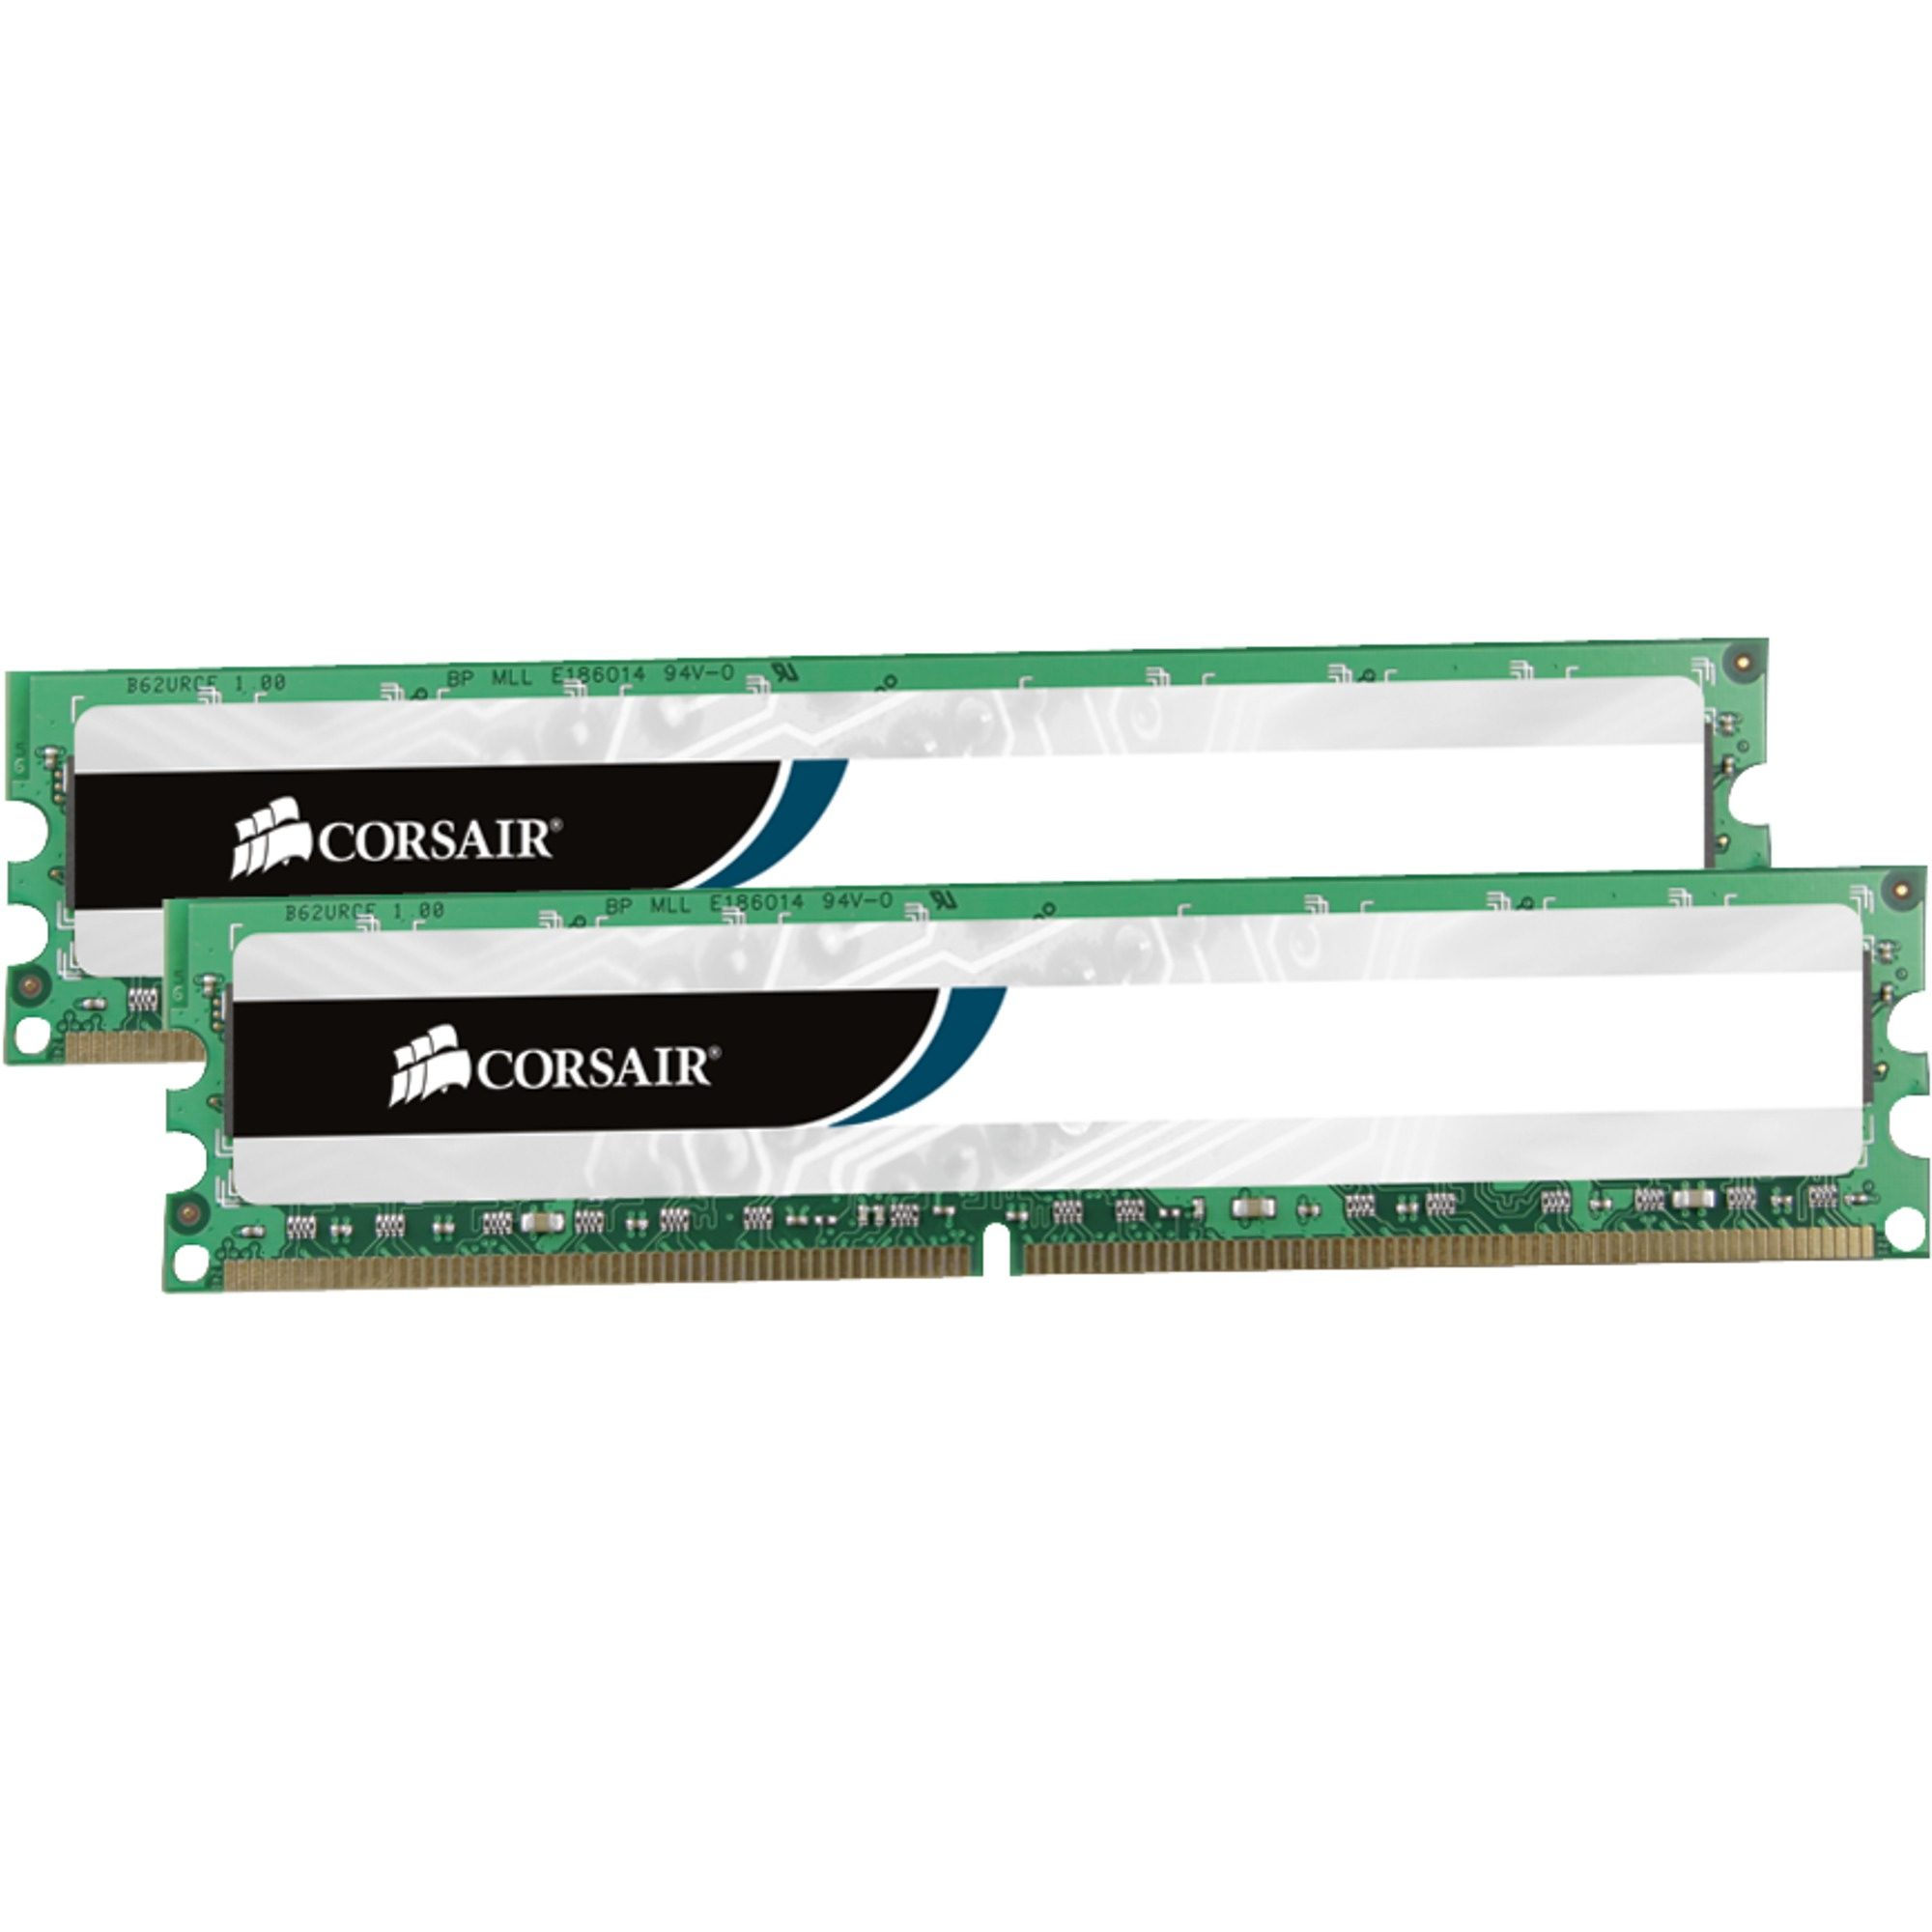 Corsair ValueSelect Arbeitsspeicher »DIMM 16 GB DDR3-1600 Kit«